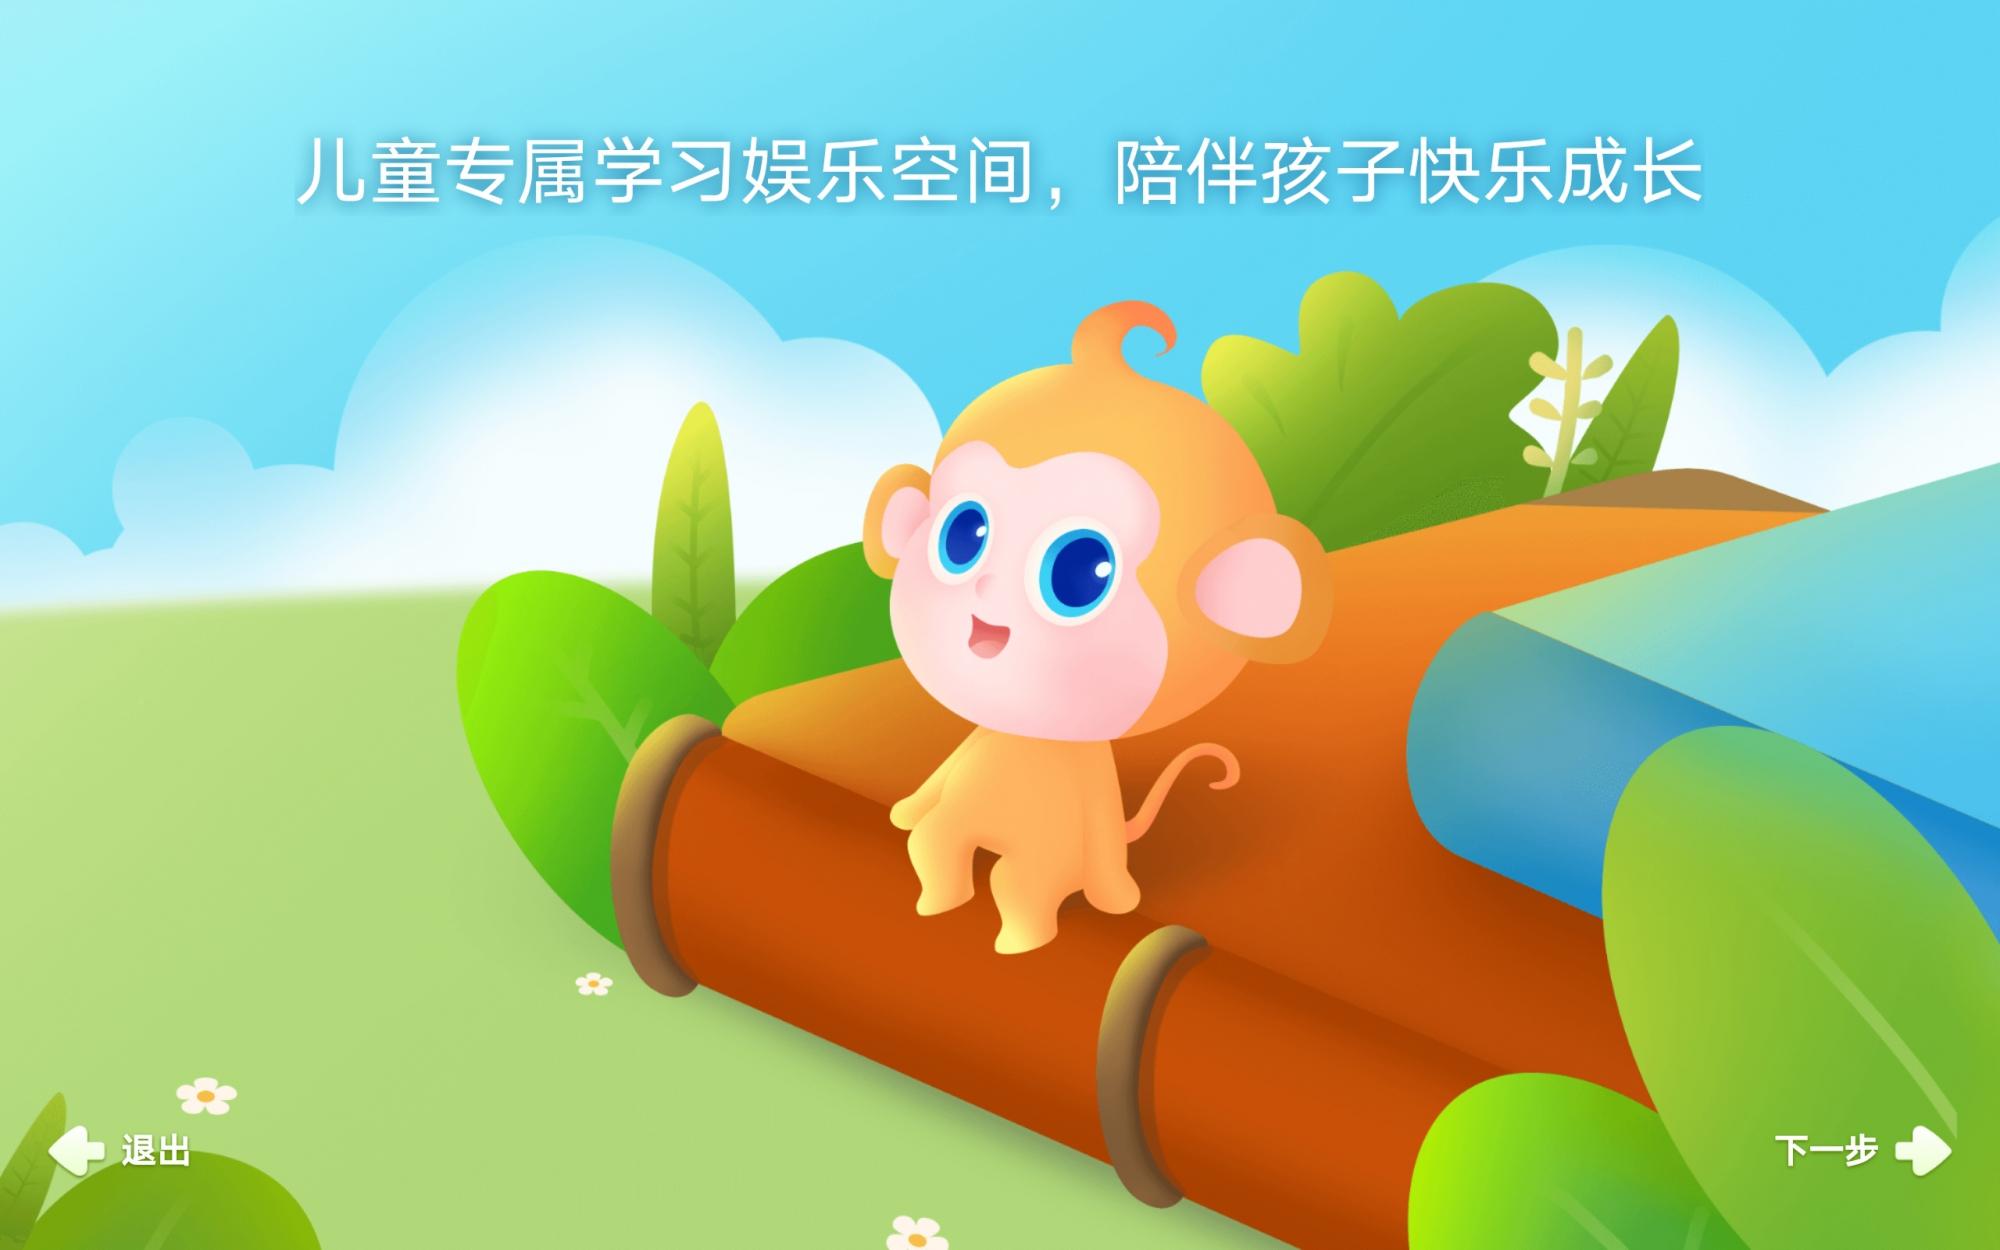 Screenshot_20200112_204956_com.huawei.kidsmode.jpg